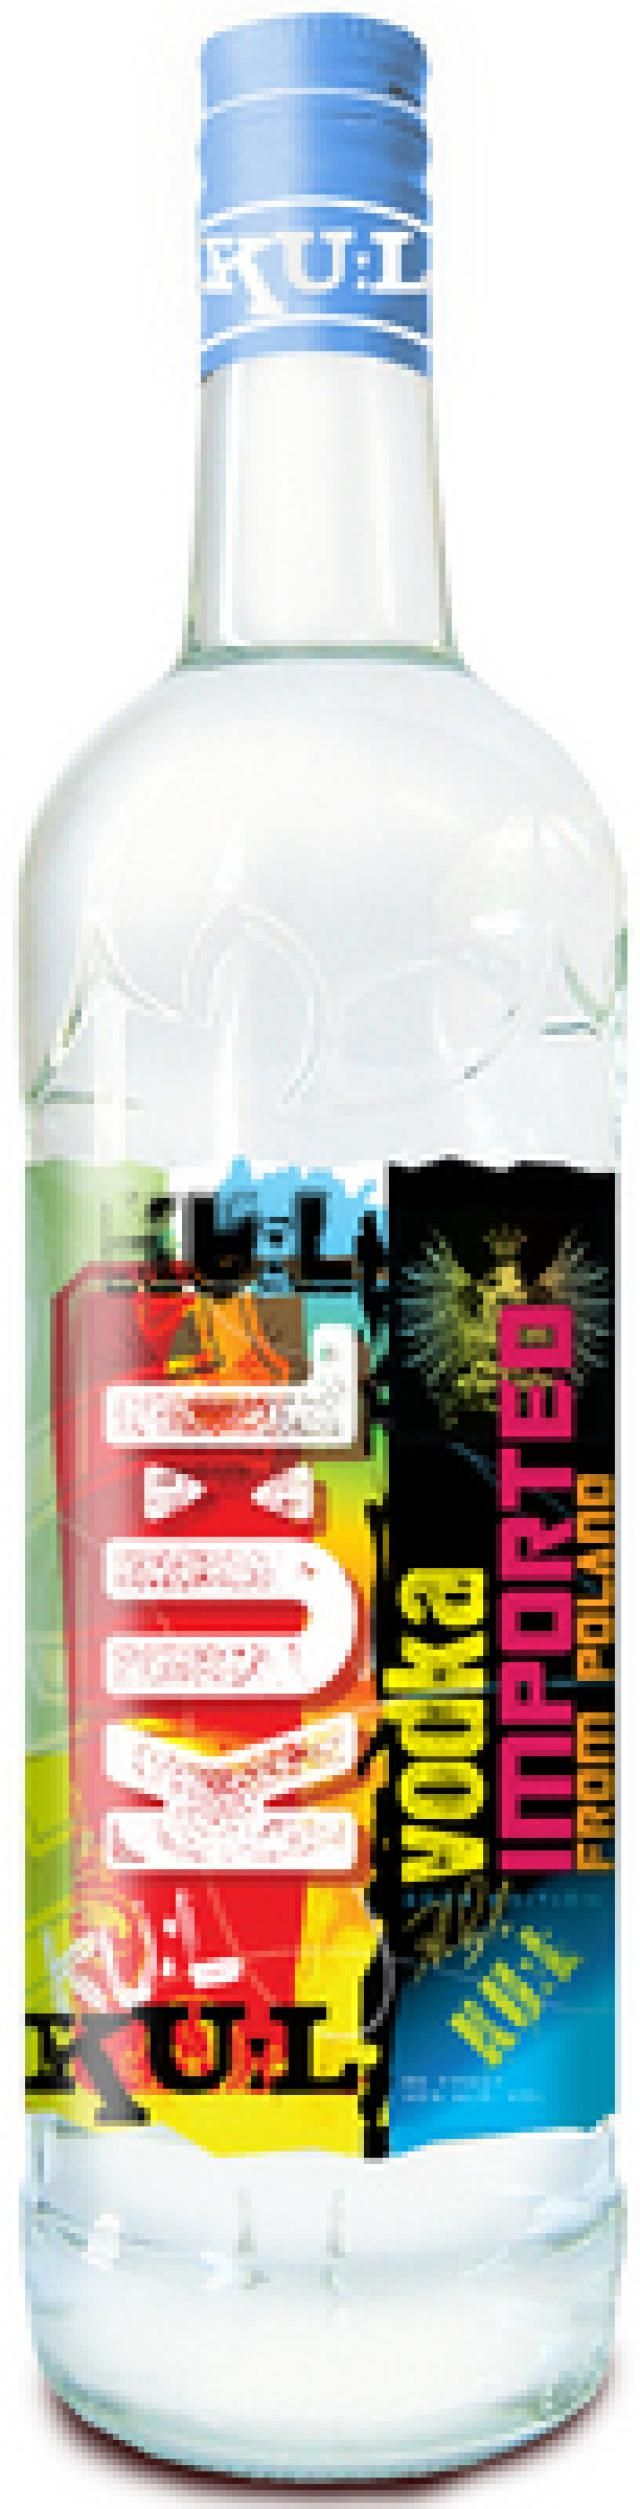 6 Cheap Vodka Brands (Under $10) You Won't Mind Serving: KU:L Vodka